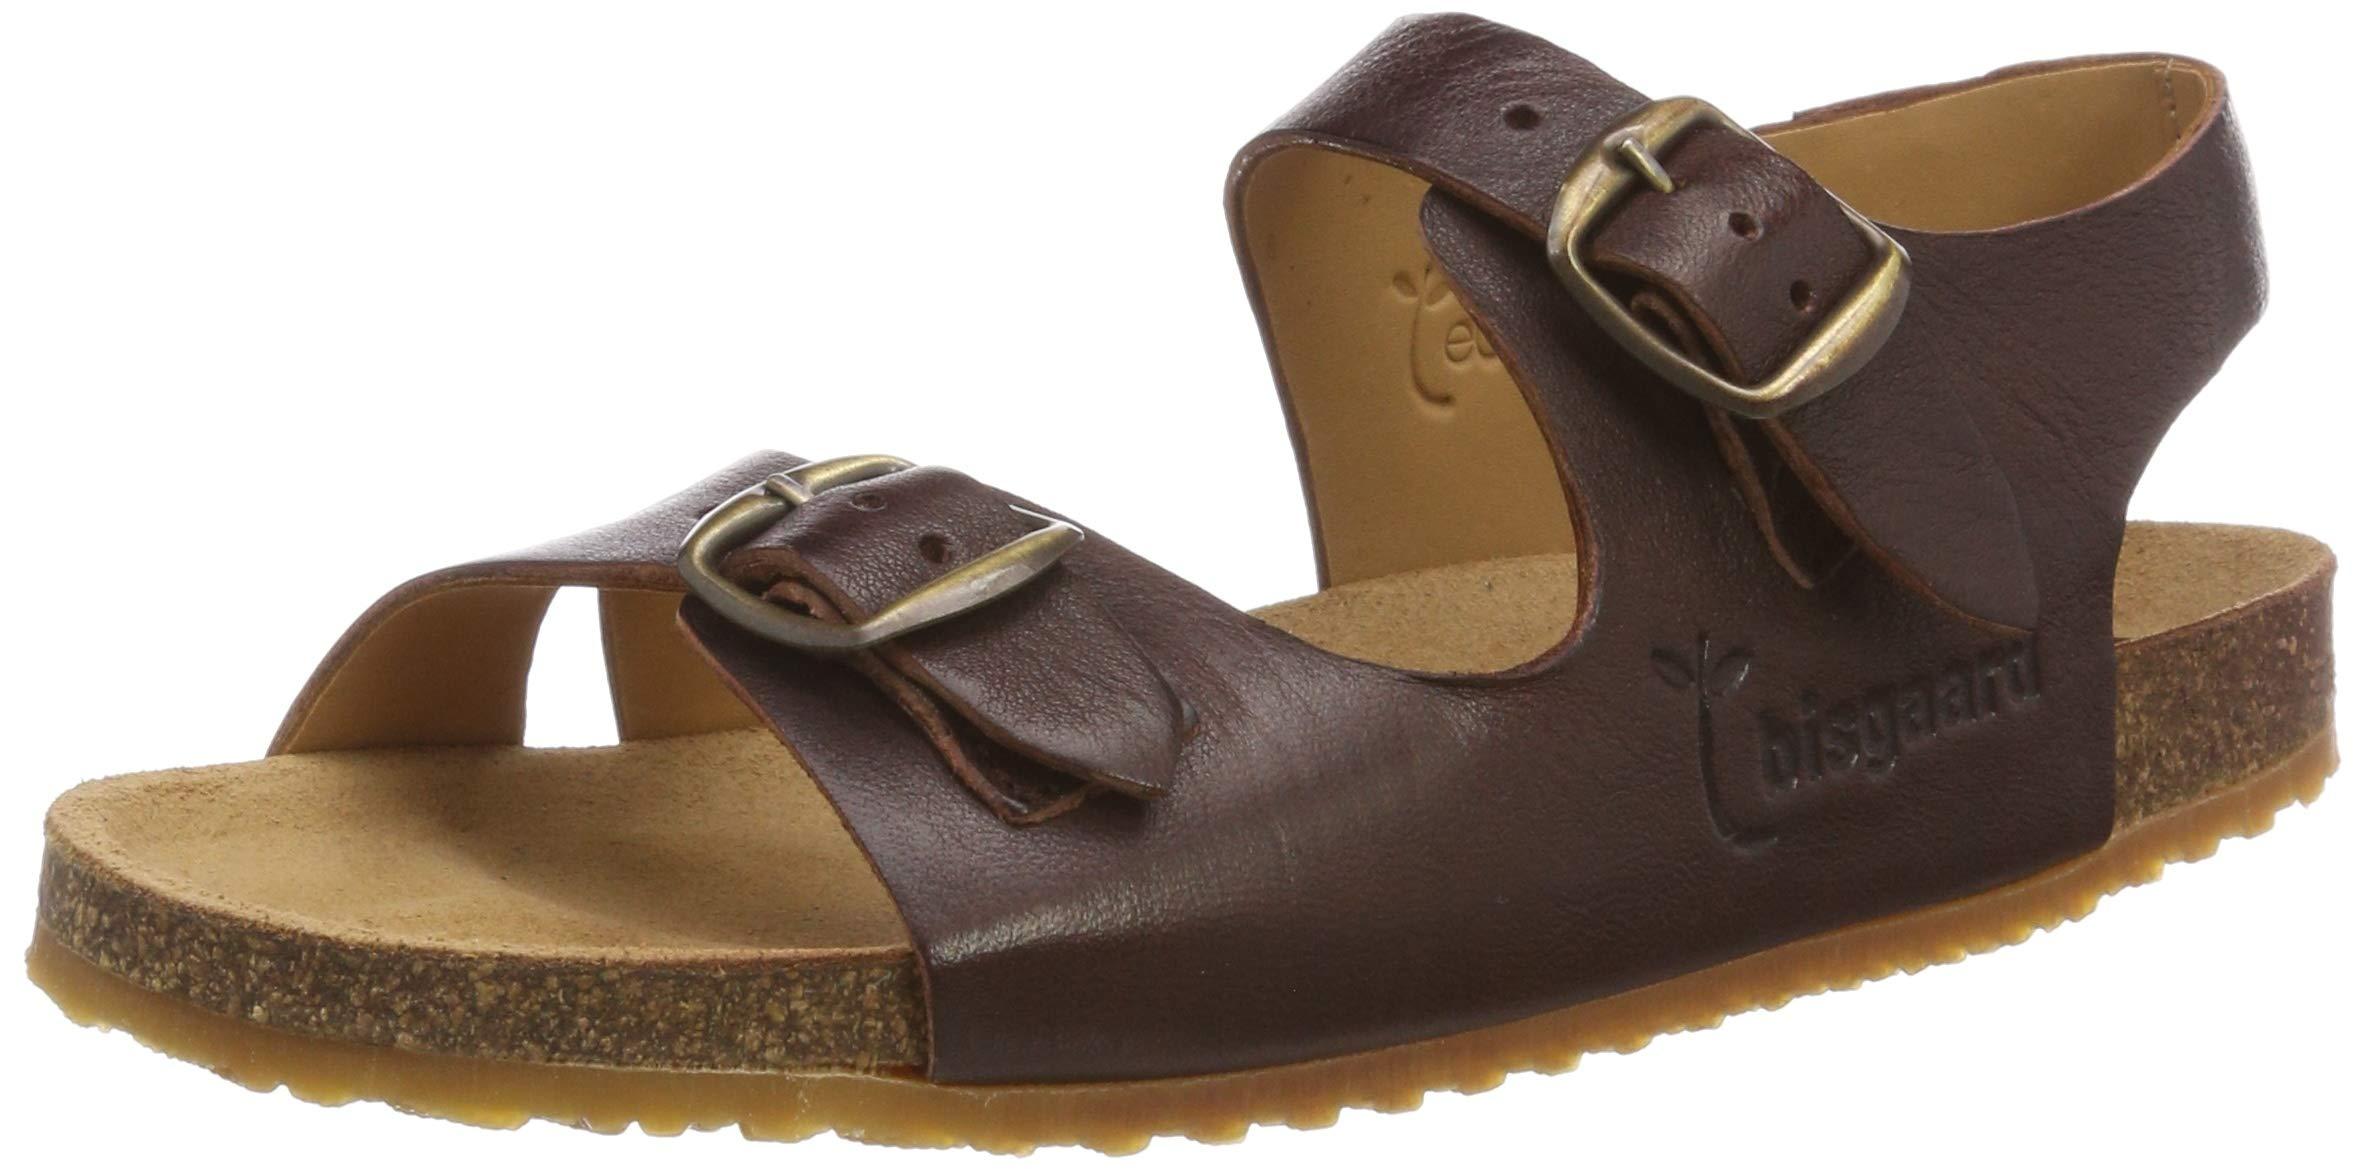 Bisgaard Unisex-Kinder 70267.119 Geschlossene Sandalen